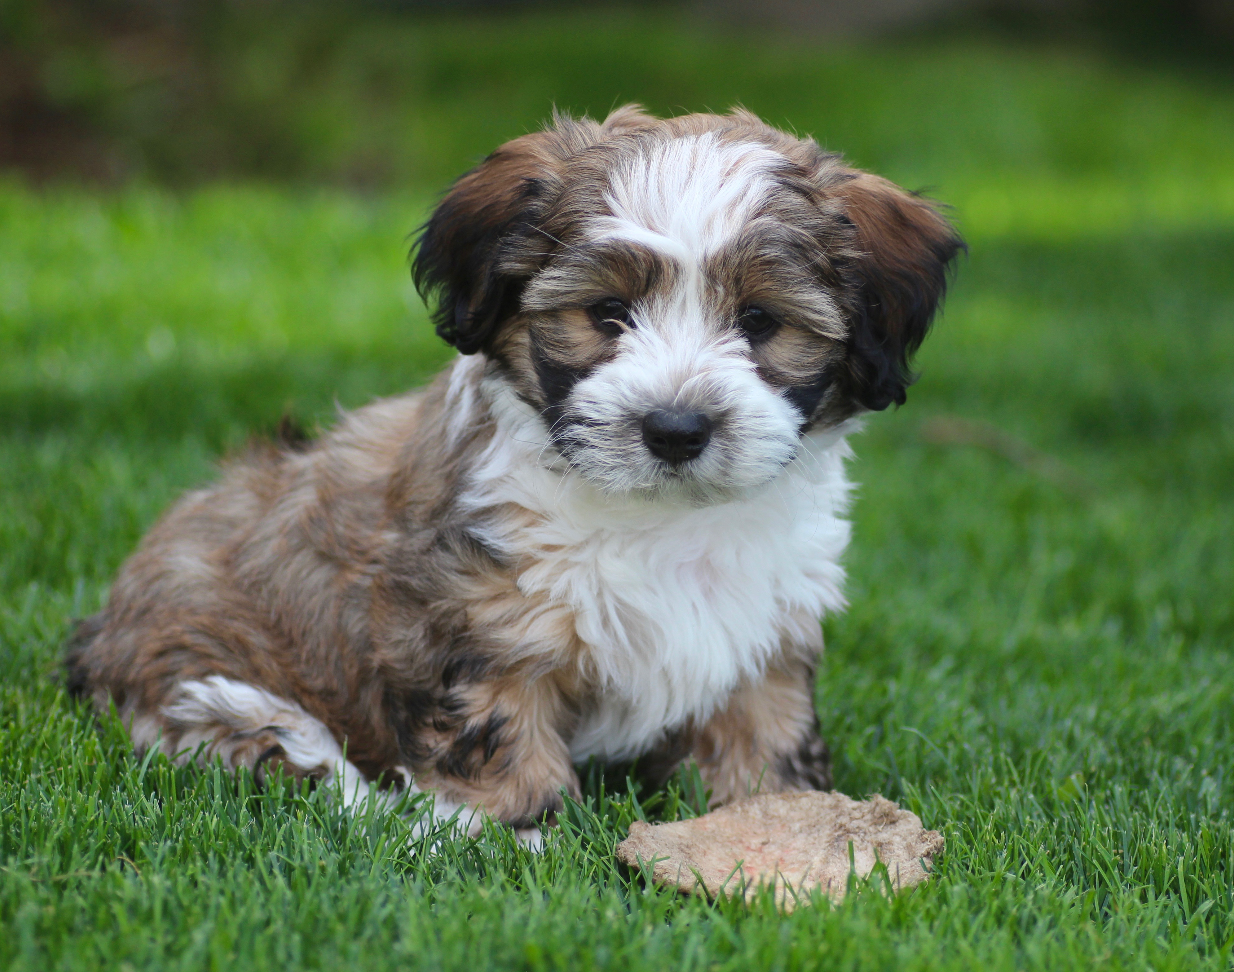 Shichon puppies for sale in kentucky - Baby Barks Bichon Shih Tzu Breeder Shichon Zuchon Puppies For Sale In Calgary